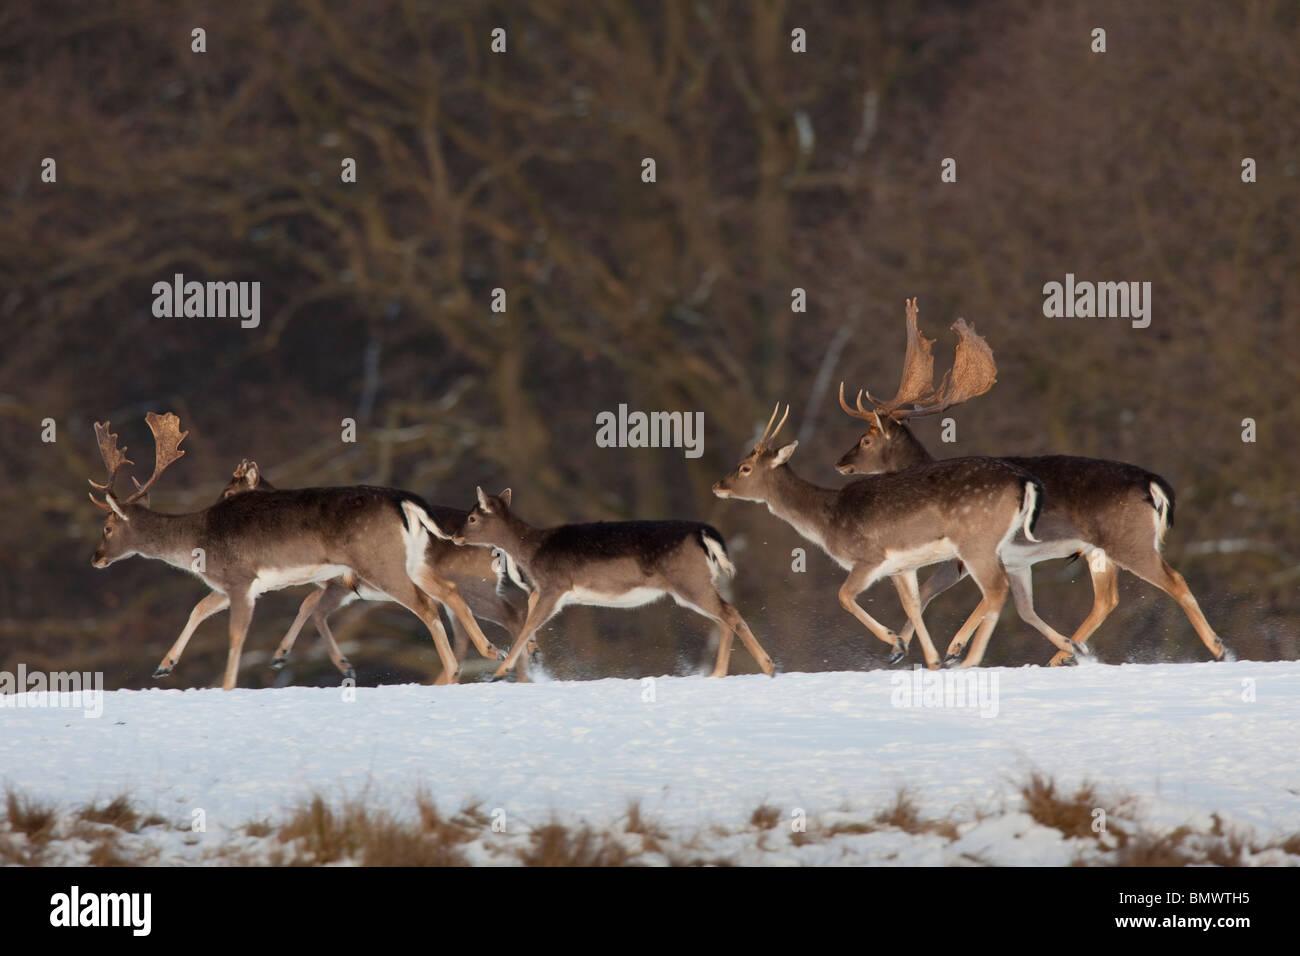 Fallow Deer (Dama dama). Fleeing group in winter. - Stock Image